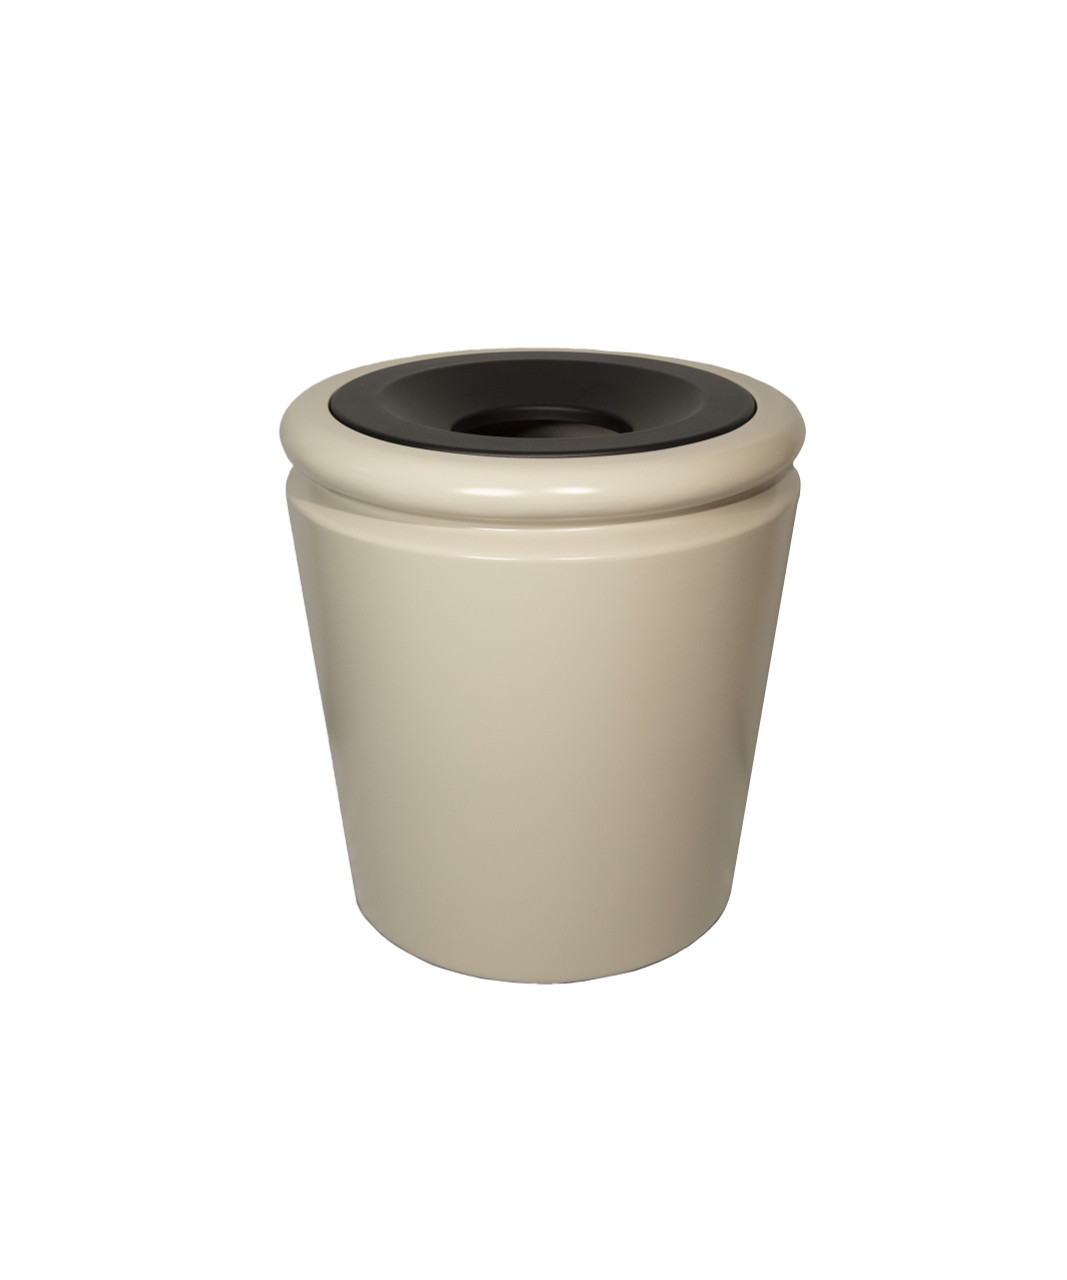 32 Gallon Fiberglass TURNBERRY Decorative Trash Receptacle